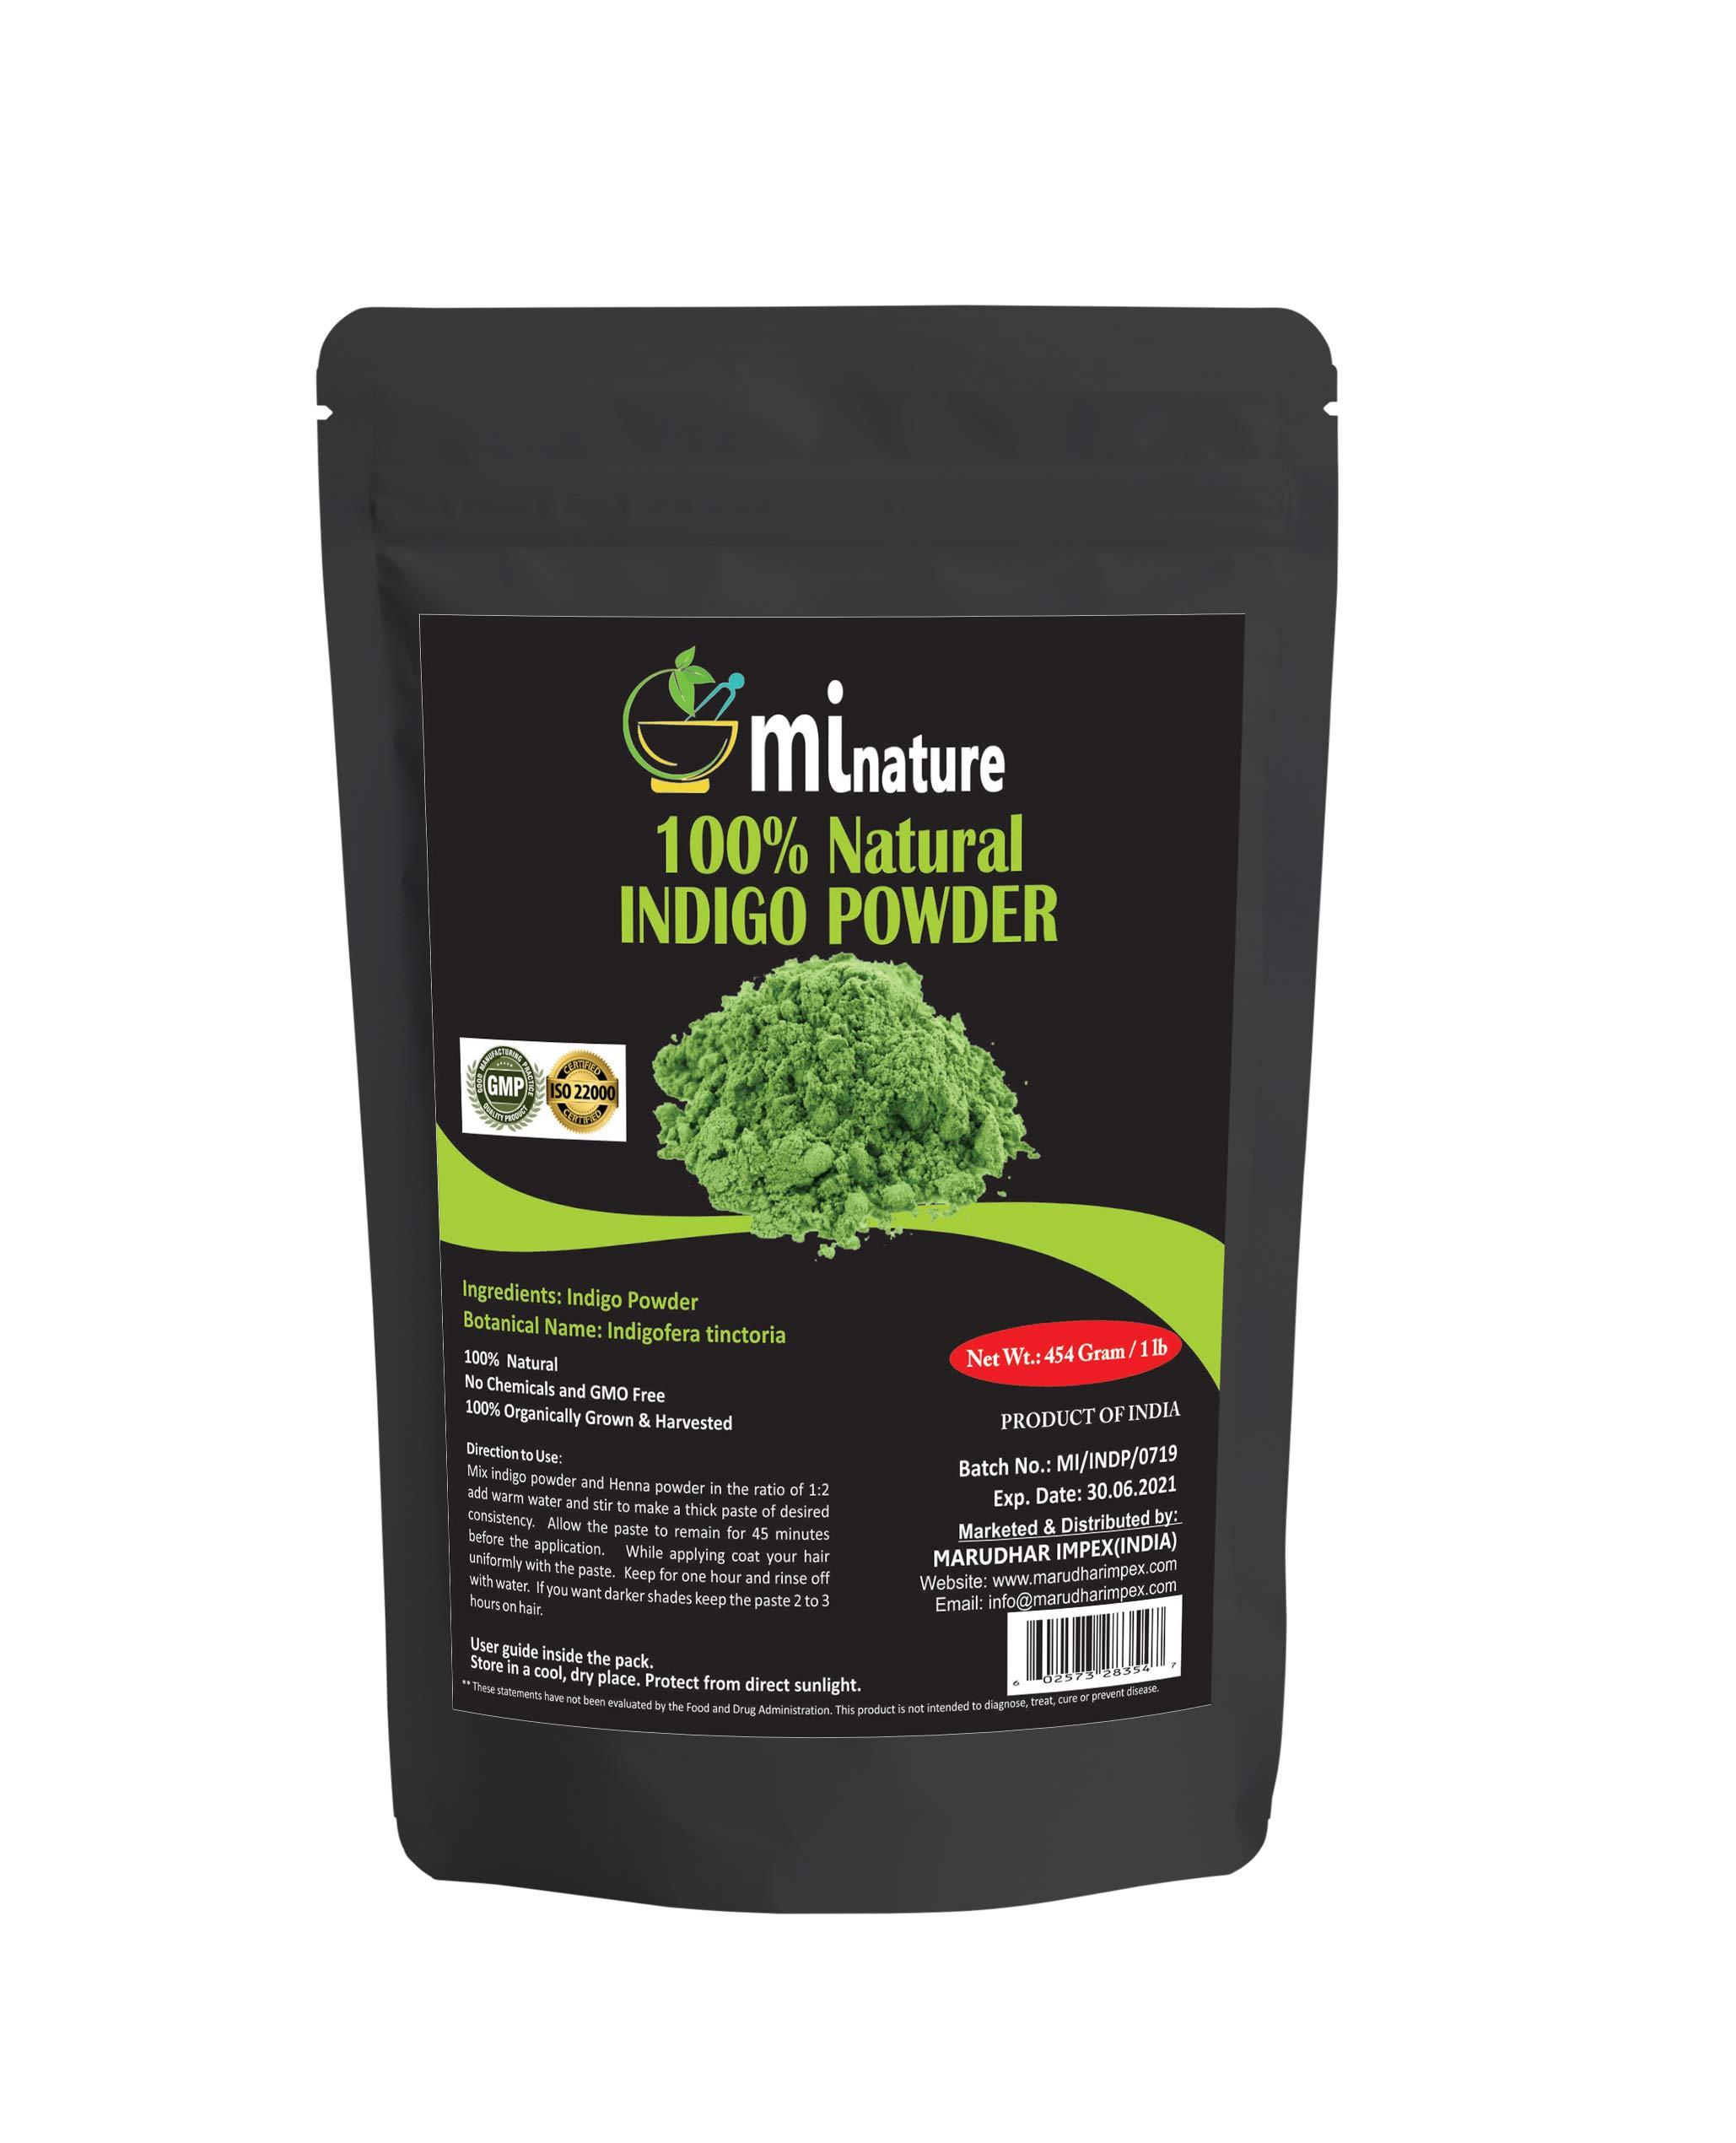 mi nature Indigo Powder -INDIGOFERA TINCTORIA,(100% NATURAL, ORGANICALLY GROWN) 1 LB (454 grams/16 ounces) RESEALABLE BAG by mi nature